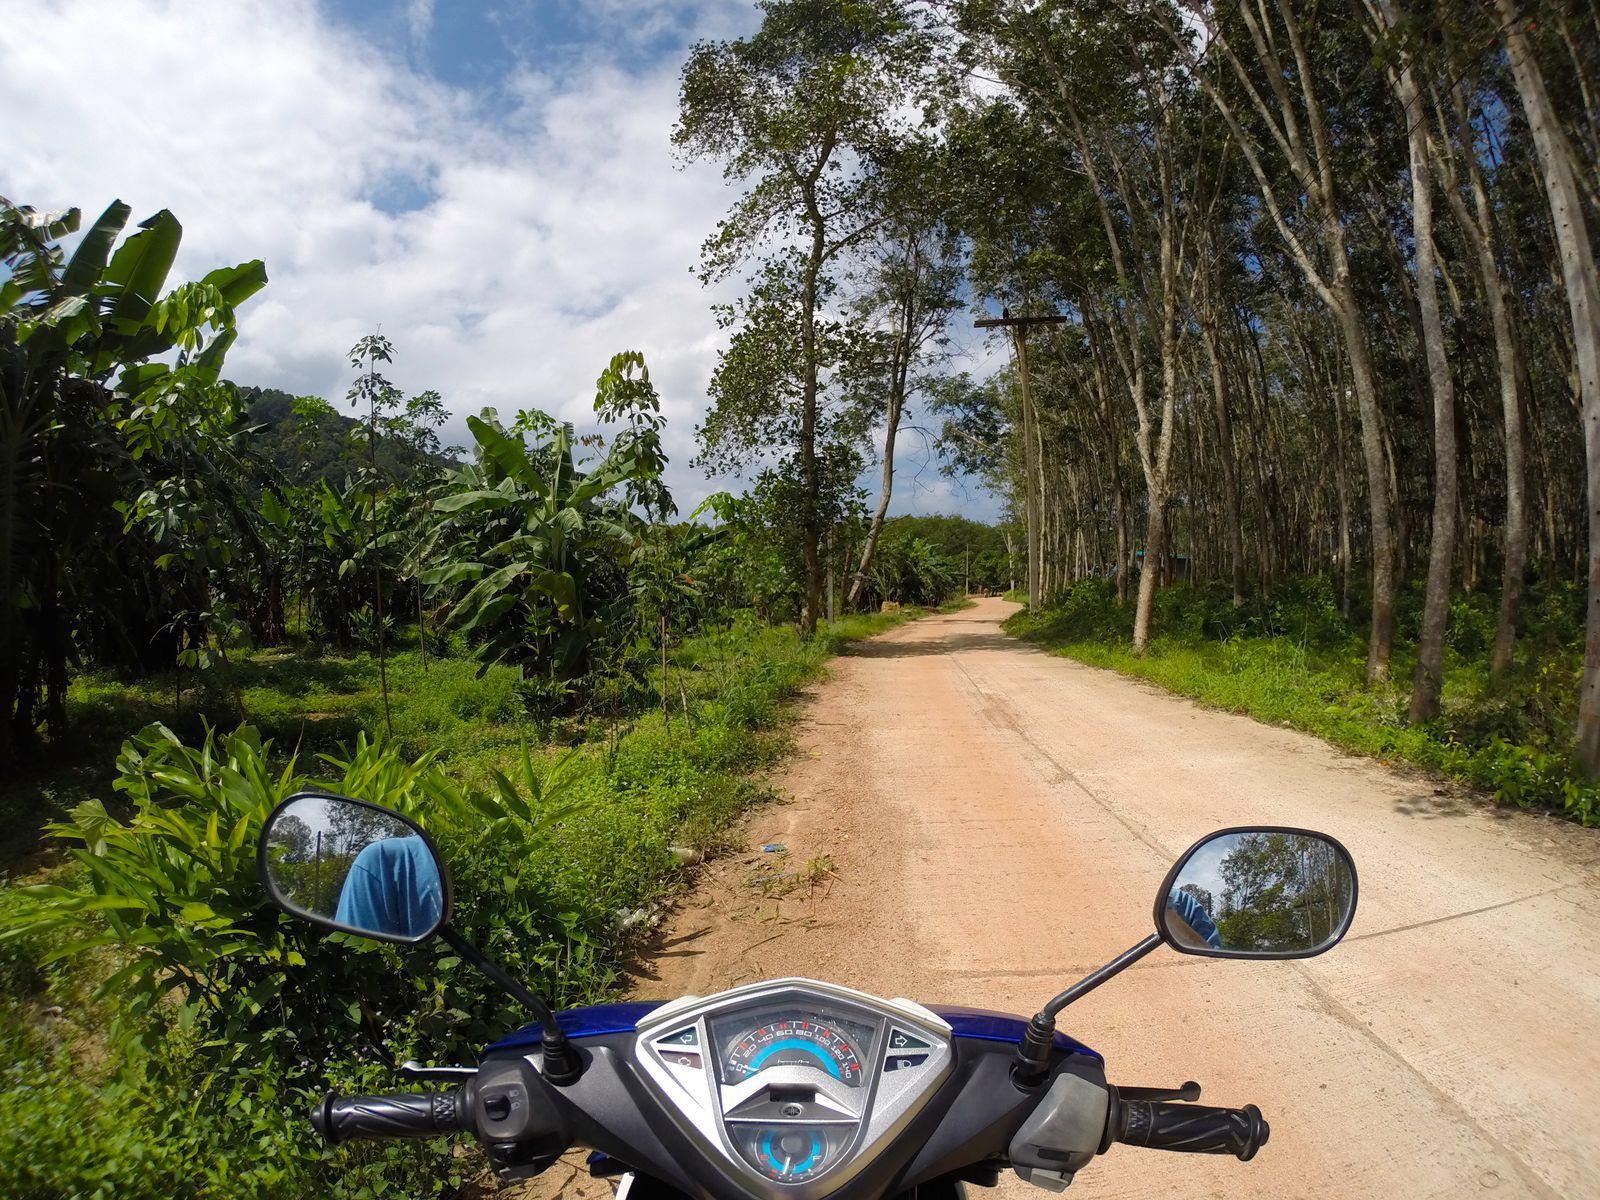 Koh Tao Moto Rental - Things to do on Koh Tao, Thailand